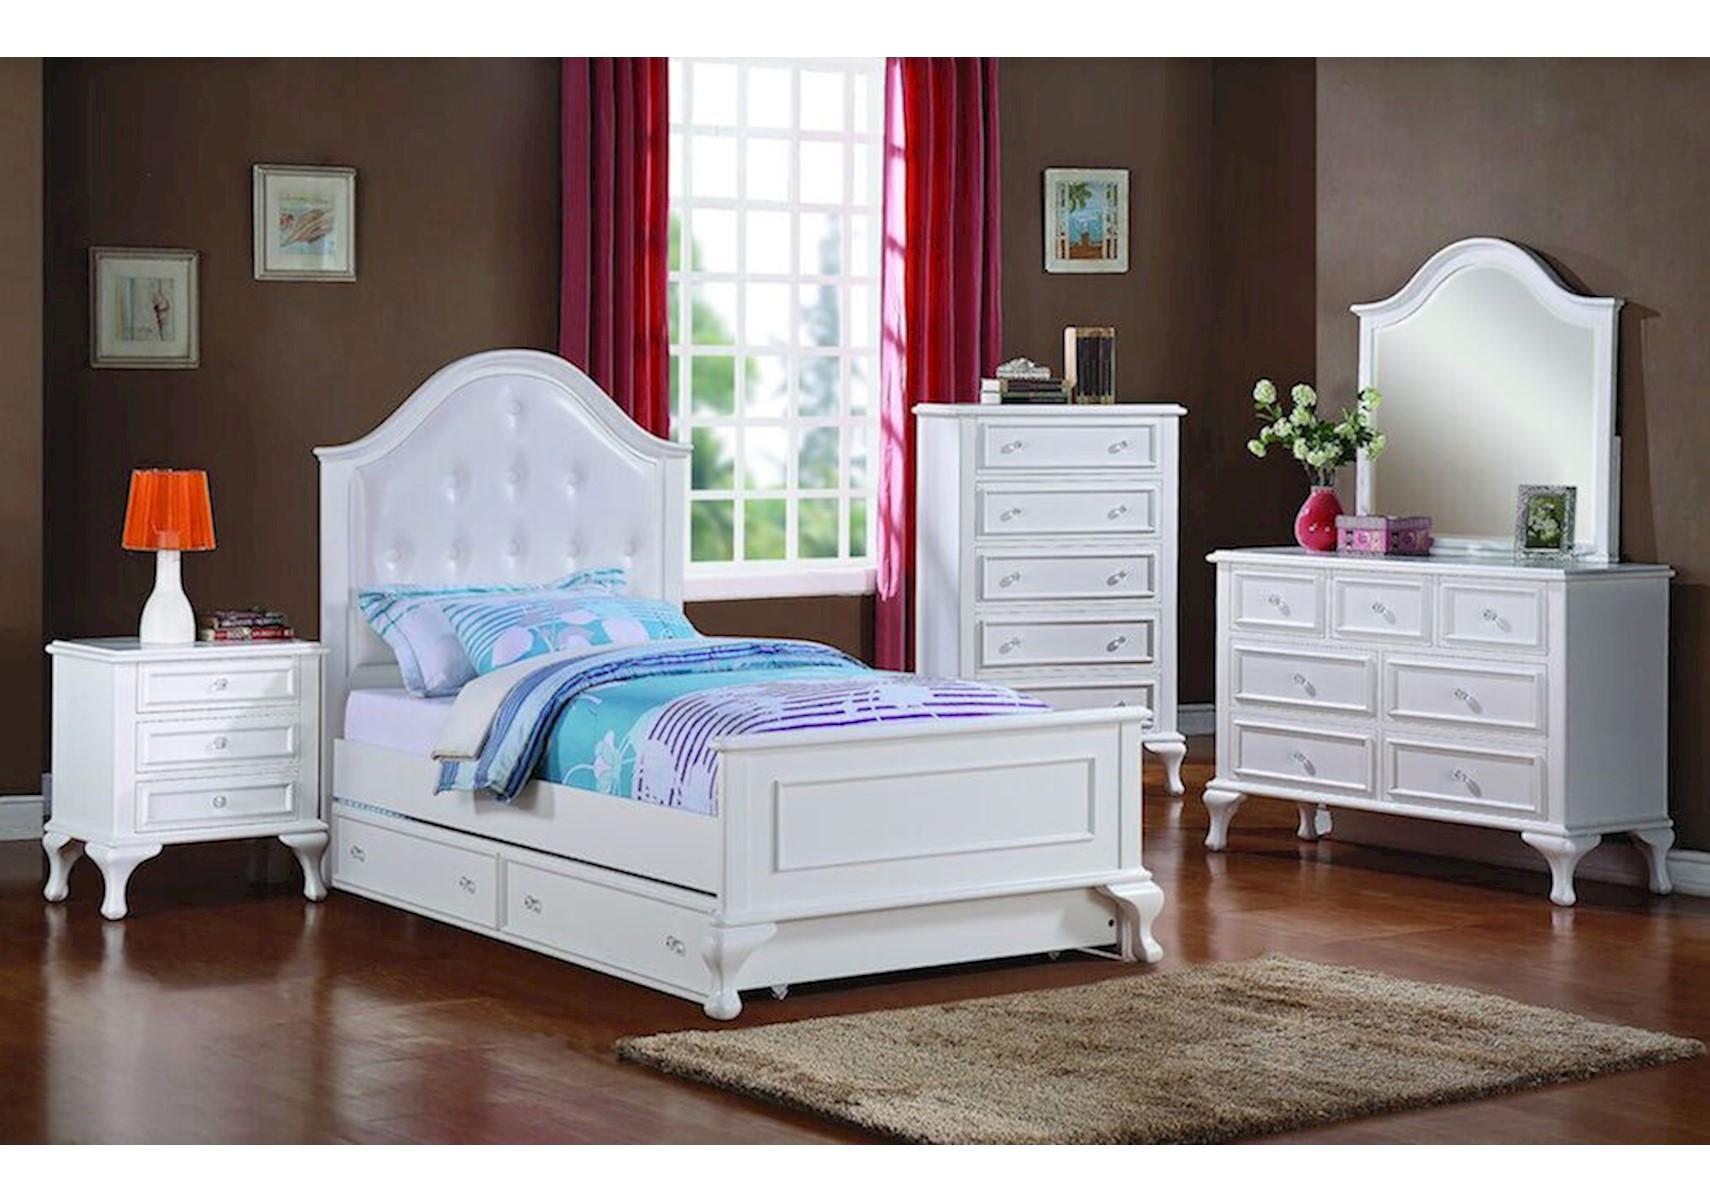 Lacks Jesse 4 Pc Kids Twin Bedroom Set